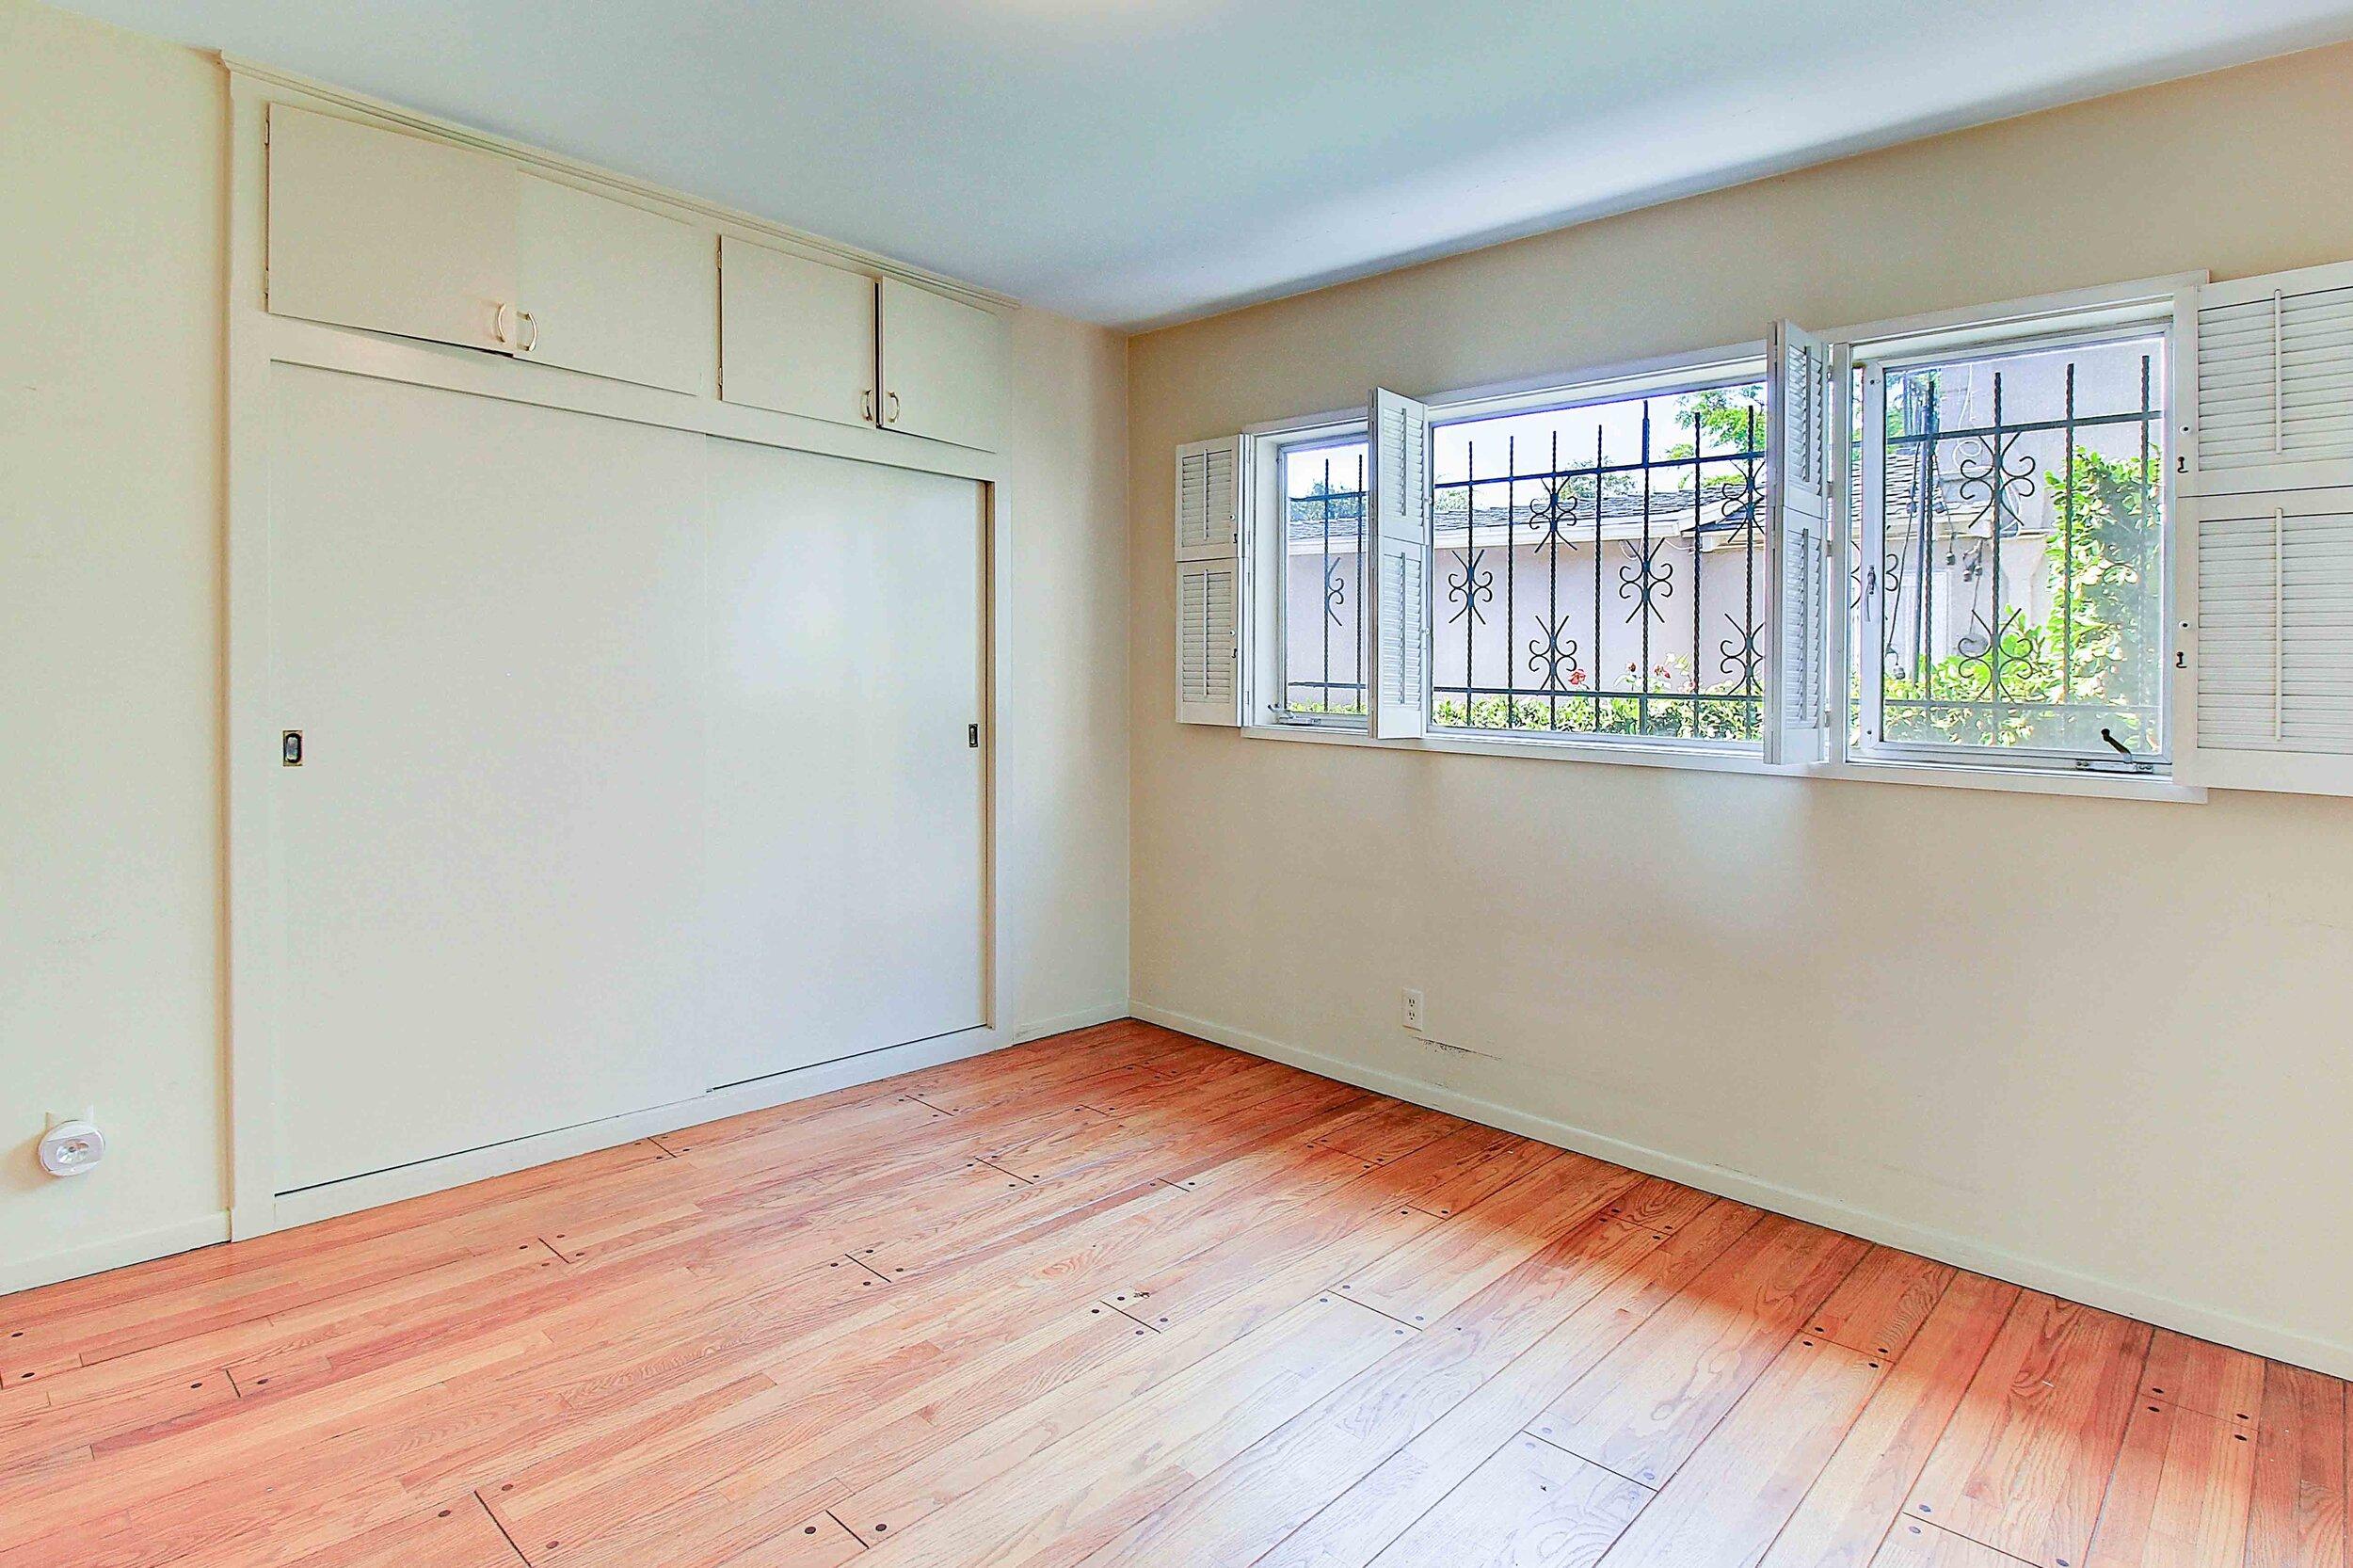 9837 Kincardine Ave -Bedroom 2.jpg